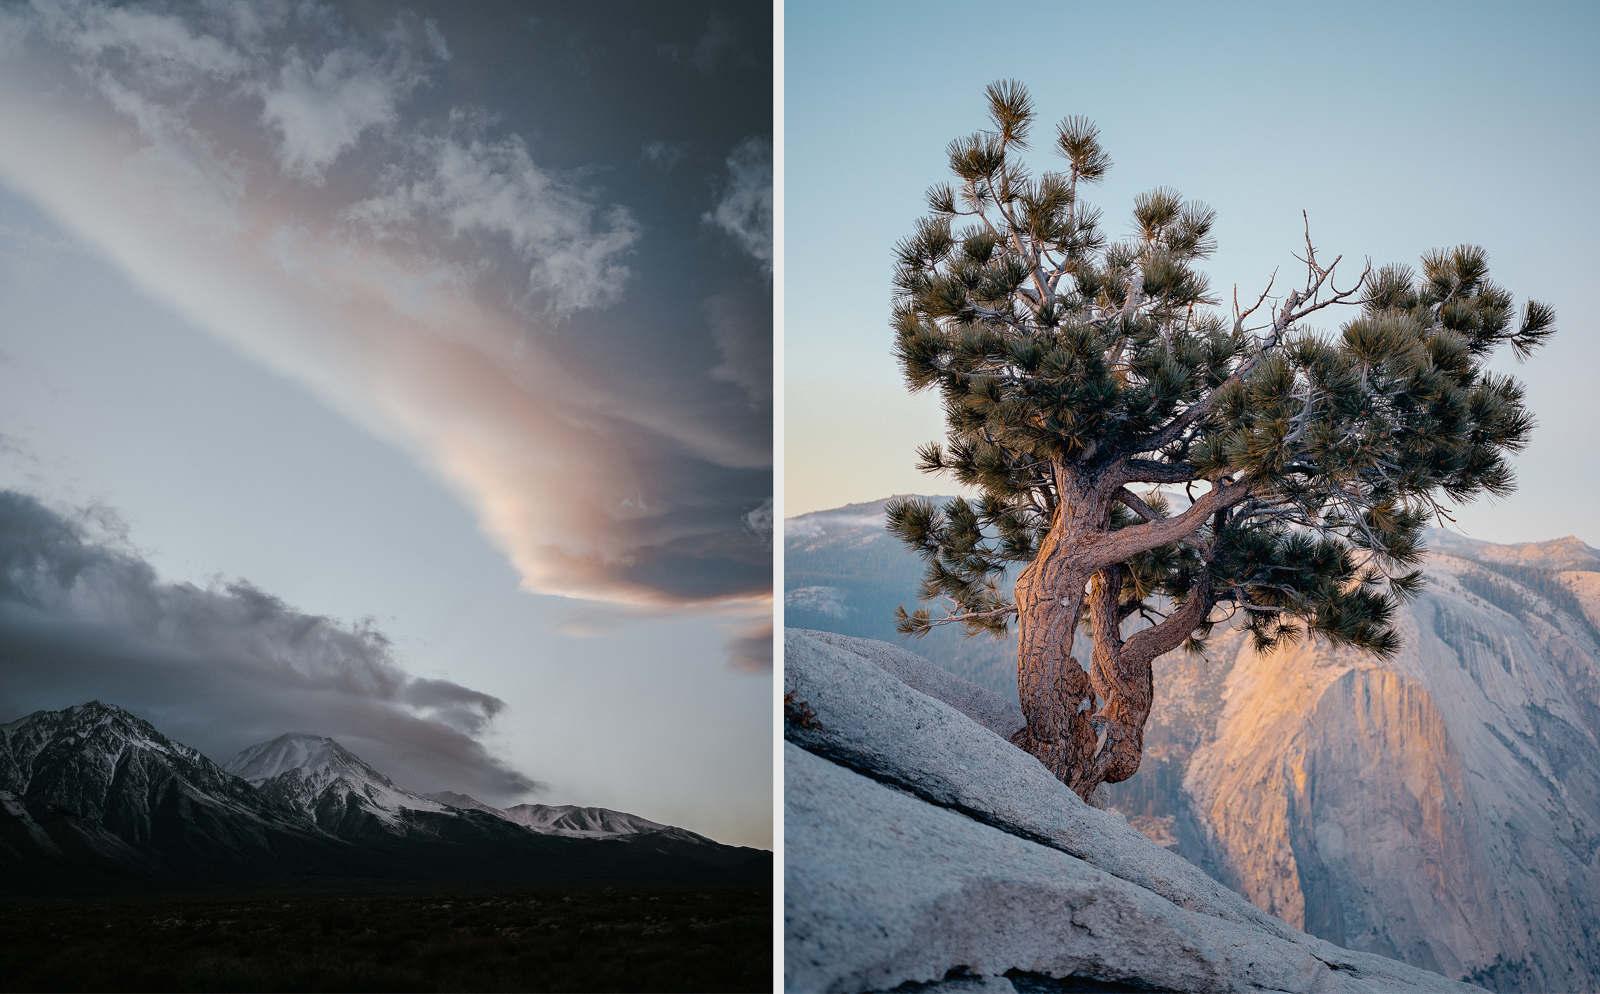 Photography_Cody_Cobb_Landscaps_03